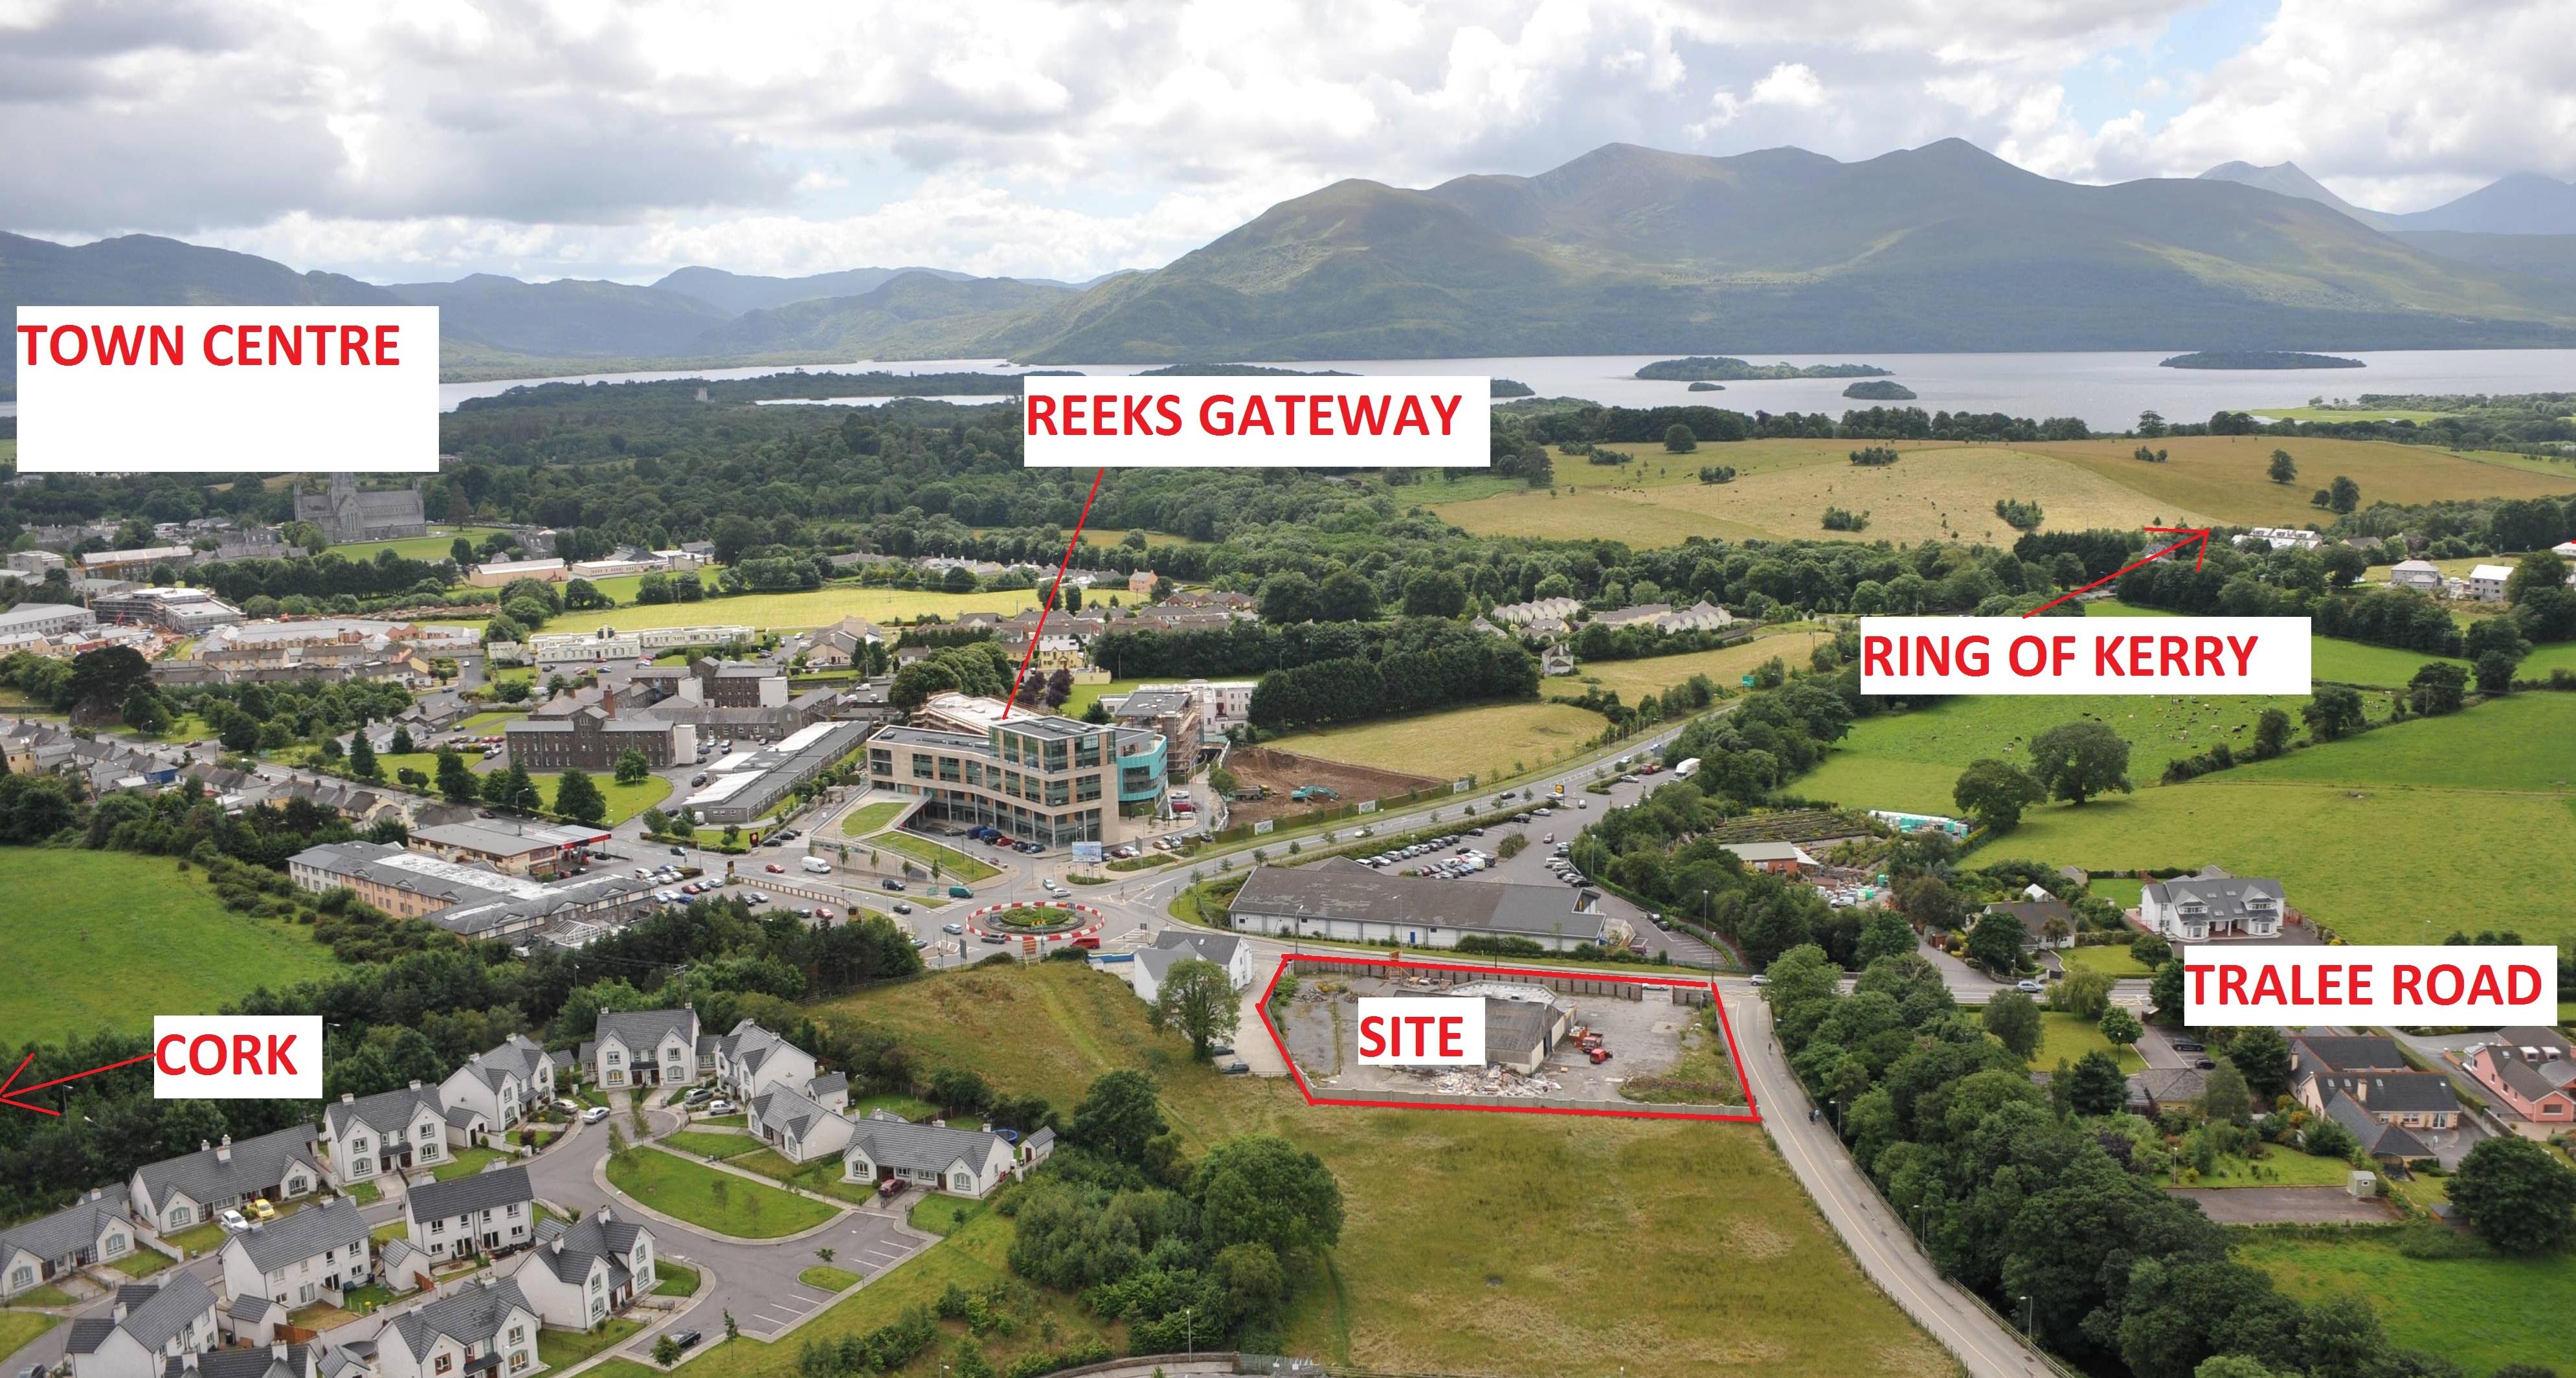 Date With Girls in Killarney (Ireland) - potteriespowertransmission.co.uk